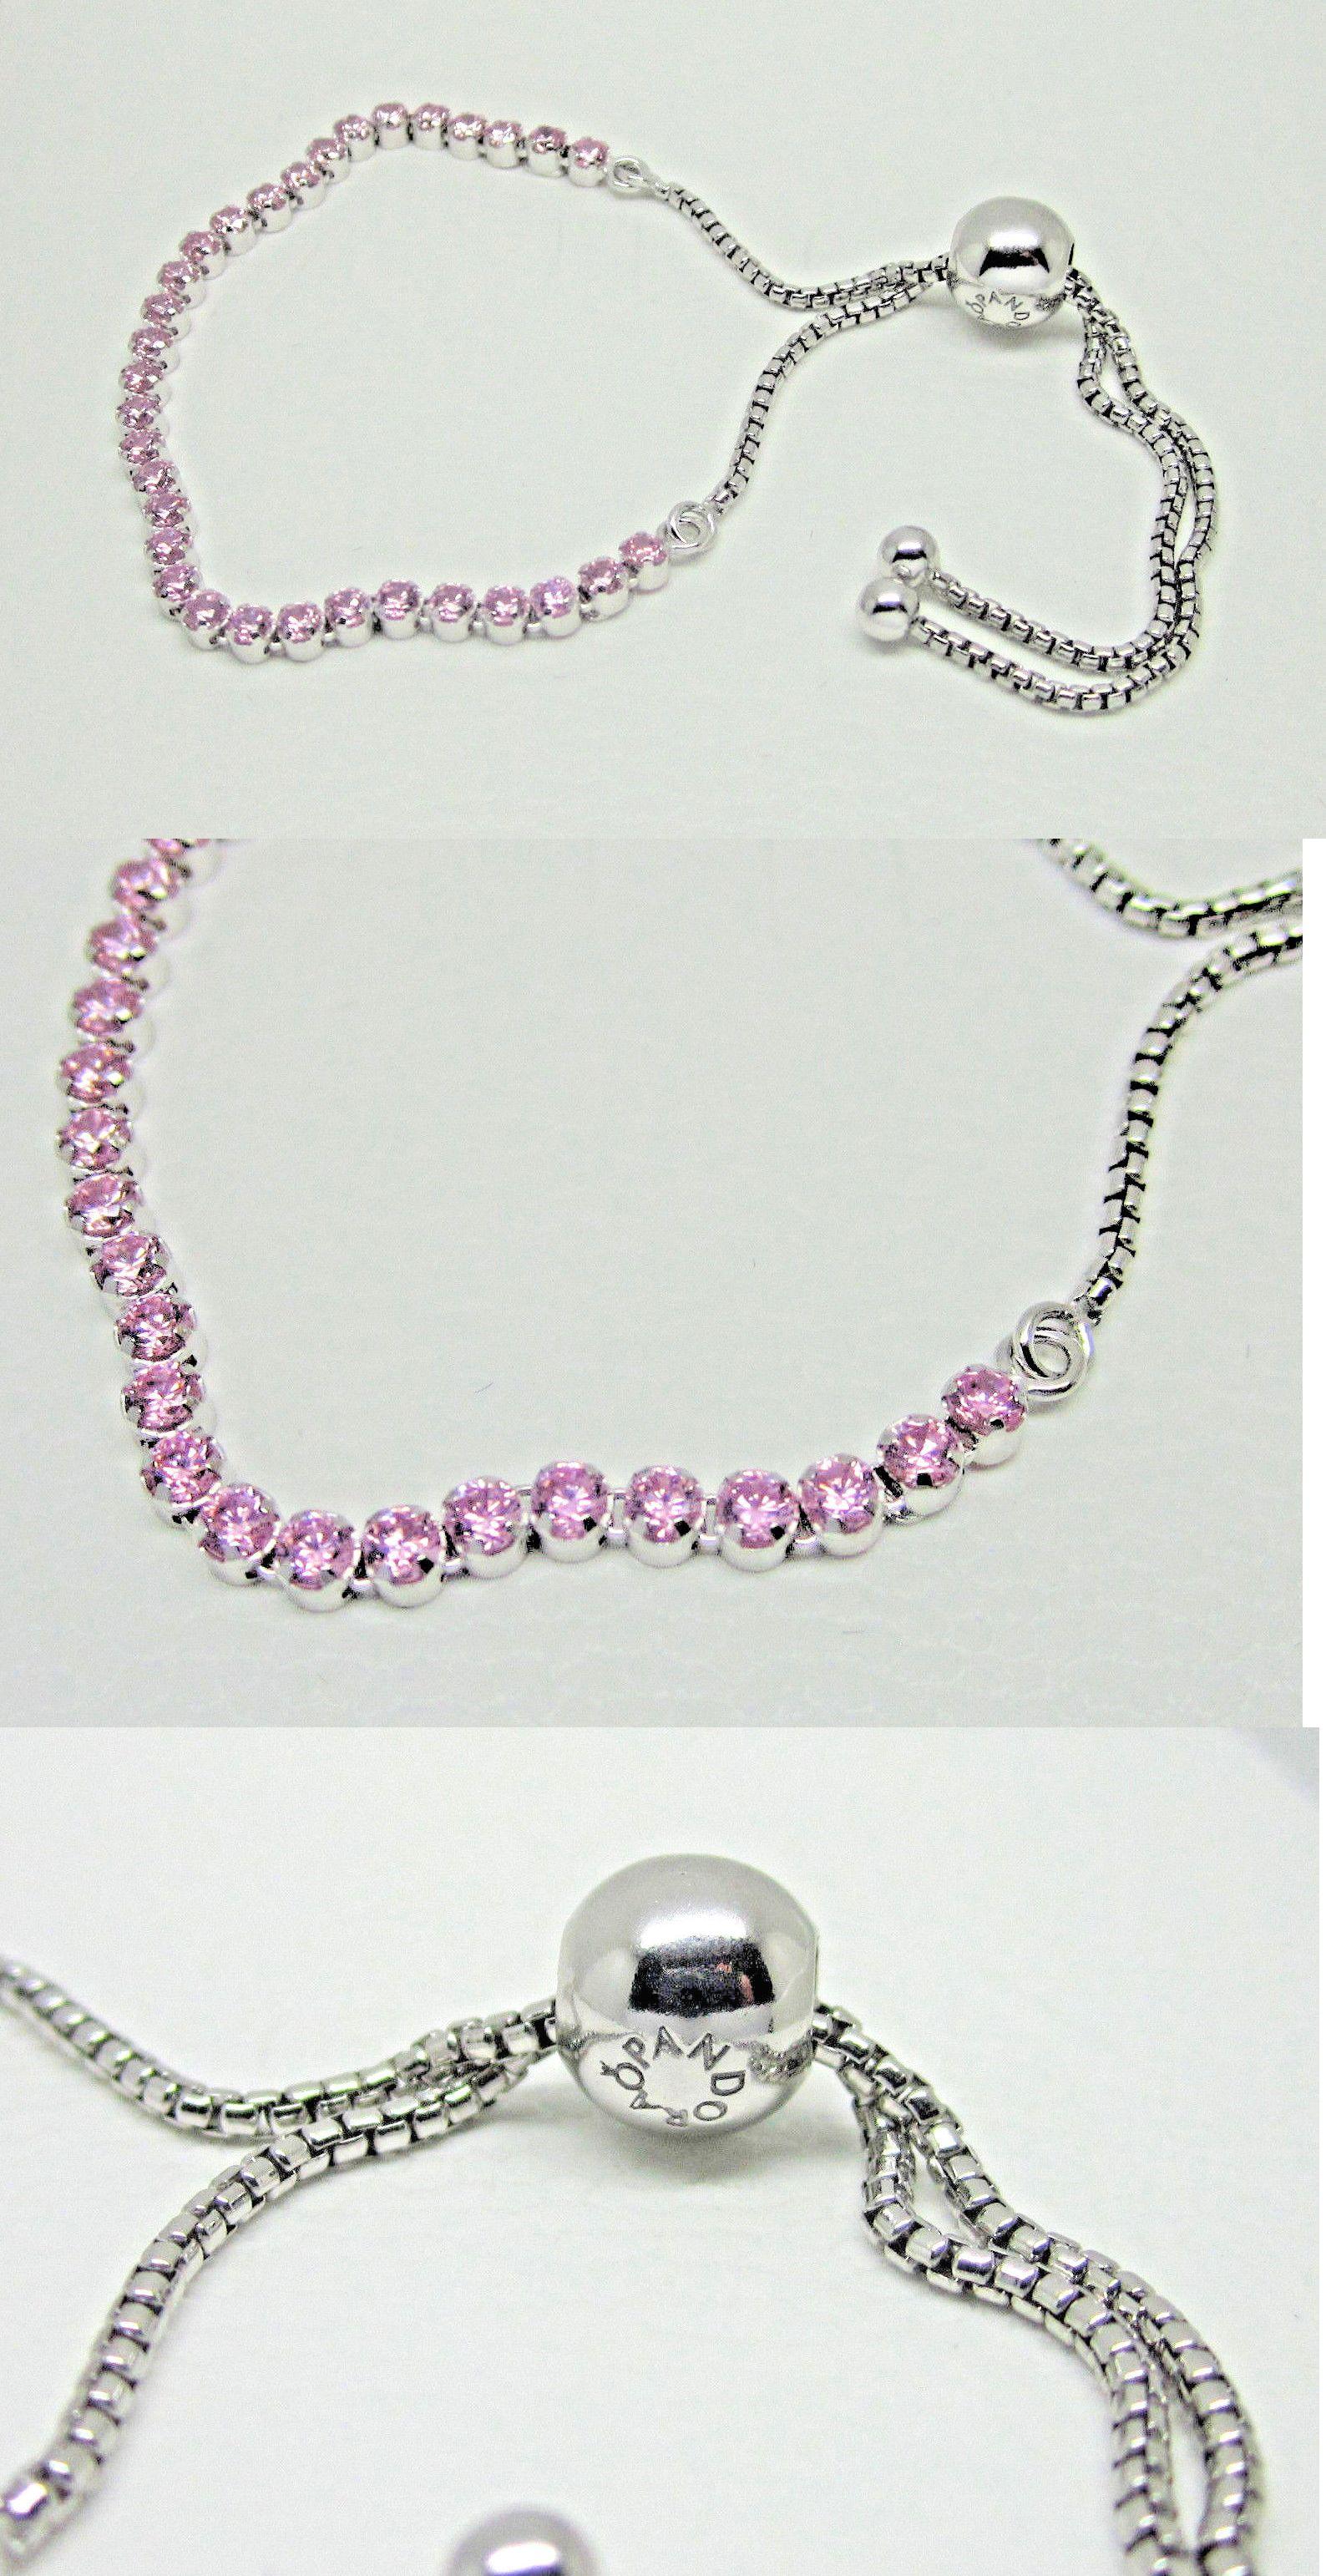 Pandora bracelet dillards - Charms And Charm Bracelets 140944 Authentic Pandora 590524pcz 2 Sparkling Strand Adjustable Pink